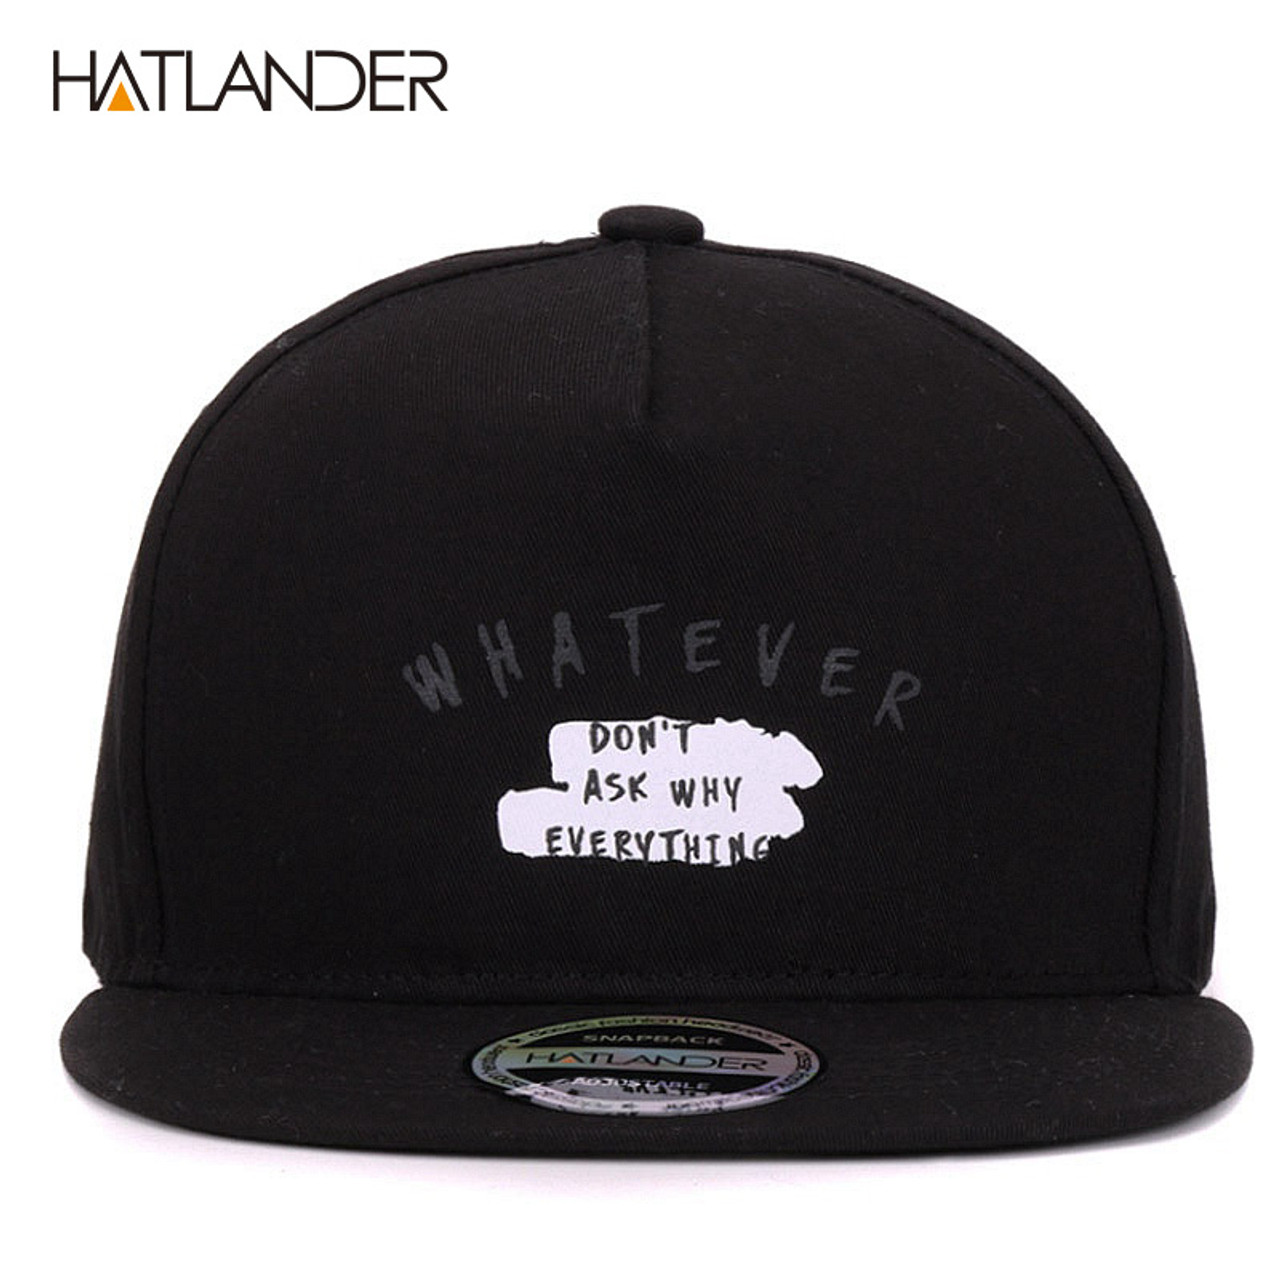 1417e71b4c1 ...  HATLANDER Solid Letter cotton baseball caps for men women outdoor  sports hats 5panel hip ...